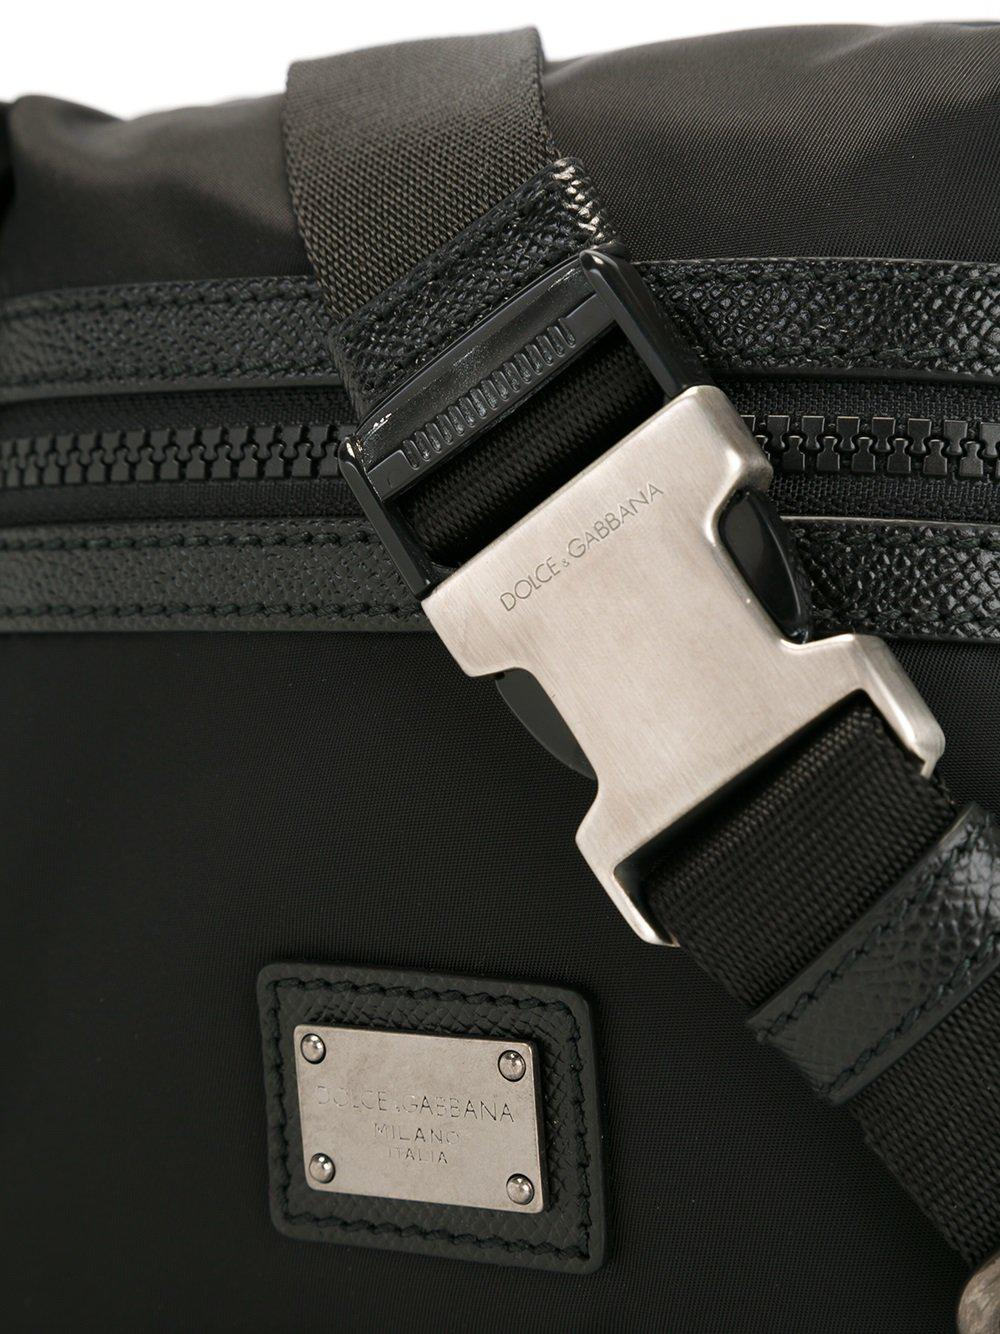 ea6b3cf19814 Dolce   Gabbana - Black Double Compartment Bumbag for Men - Lyst. View  fullscreen